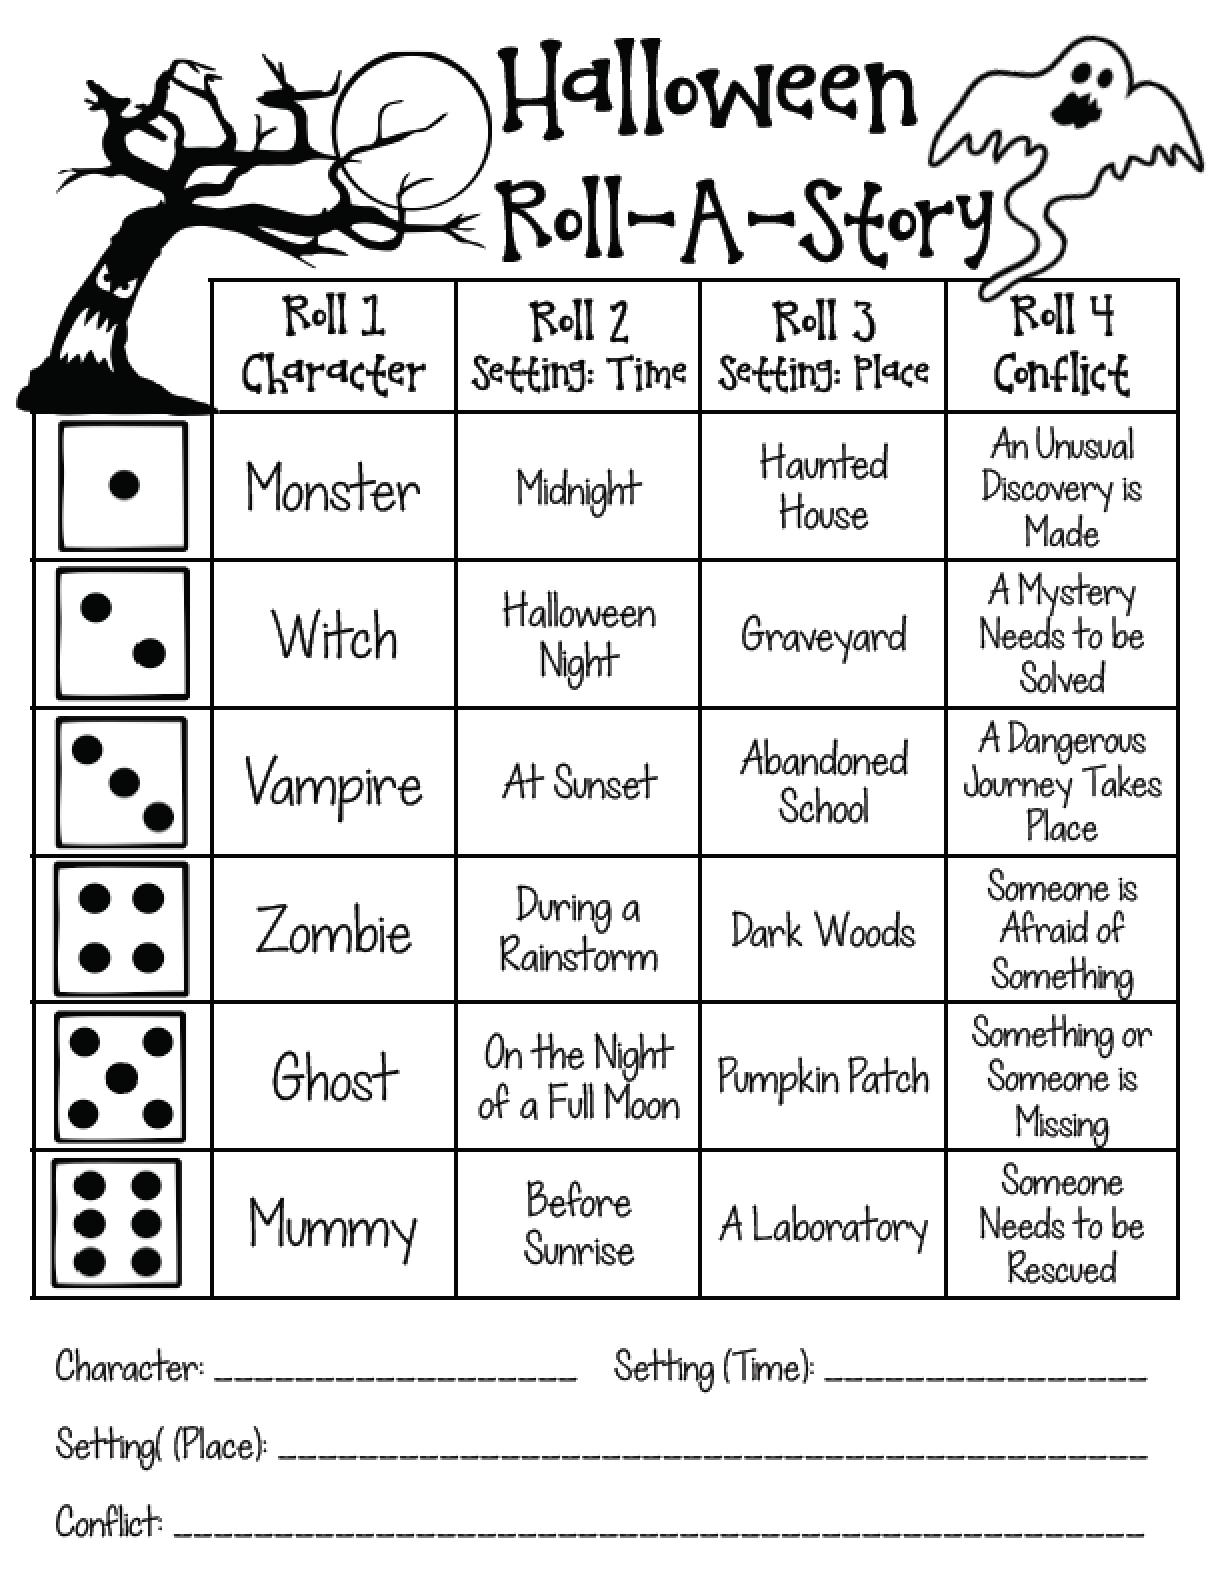 Pin On Halloween Themed Therapy Activities/treats